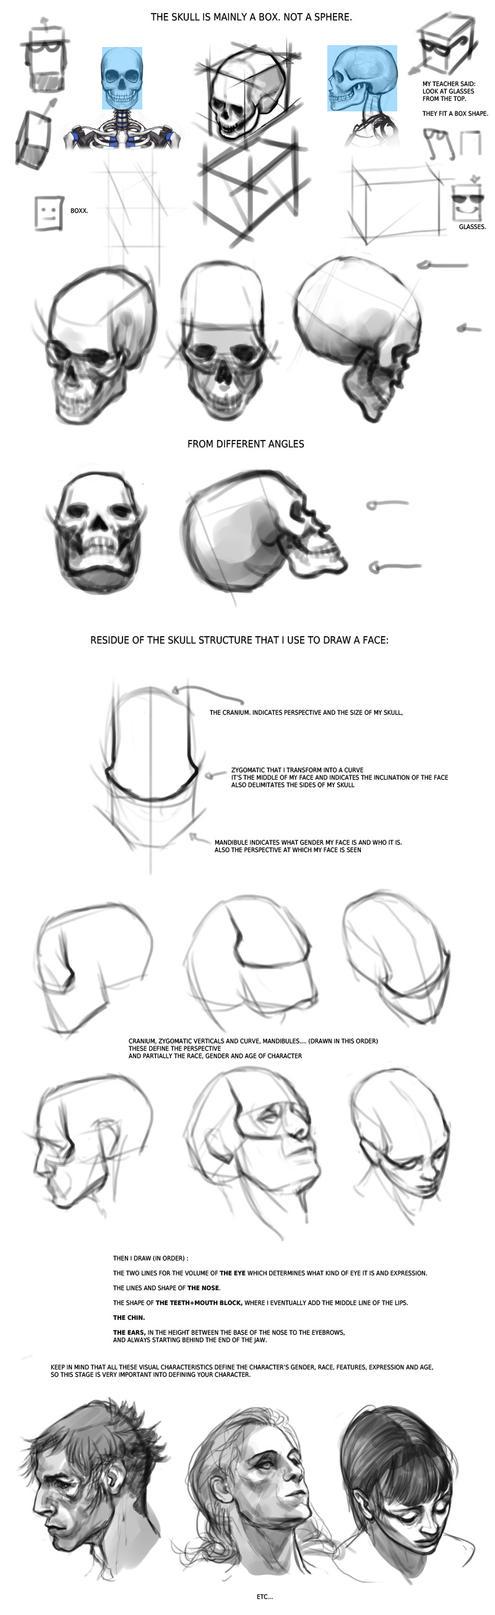 Quick Facial Anatomy Tips by Smirtouille on DeviantArt